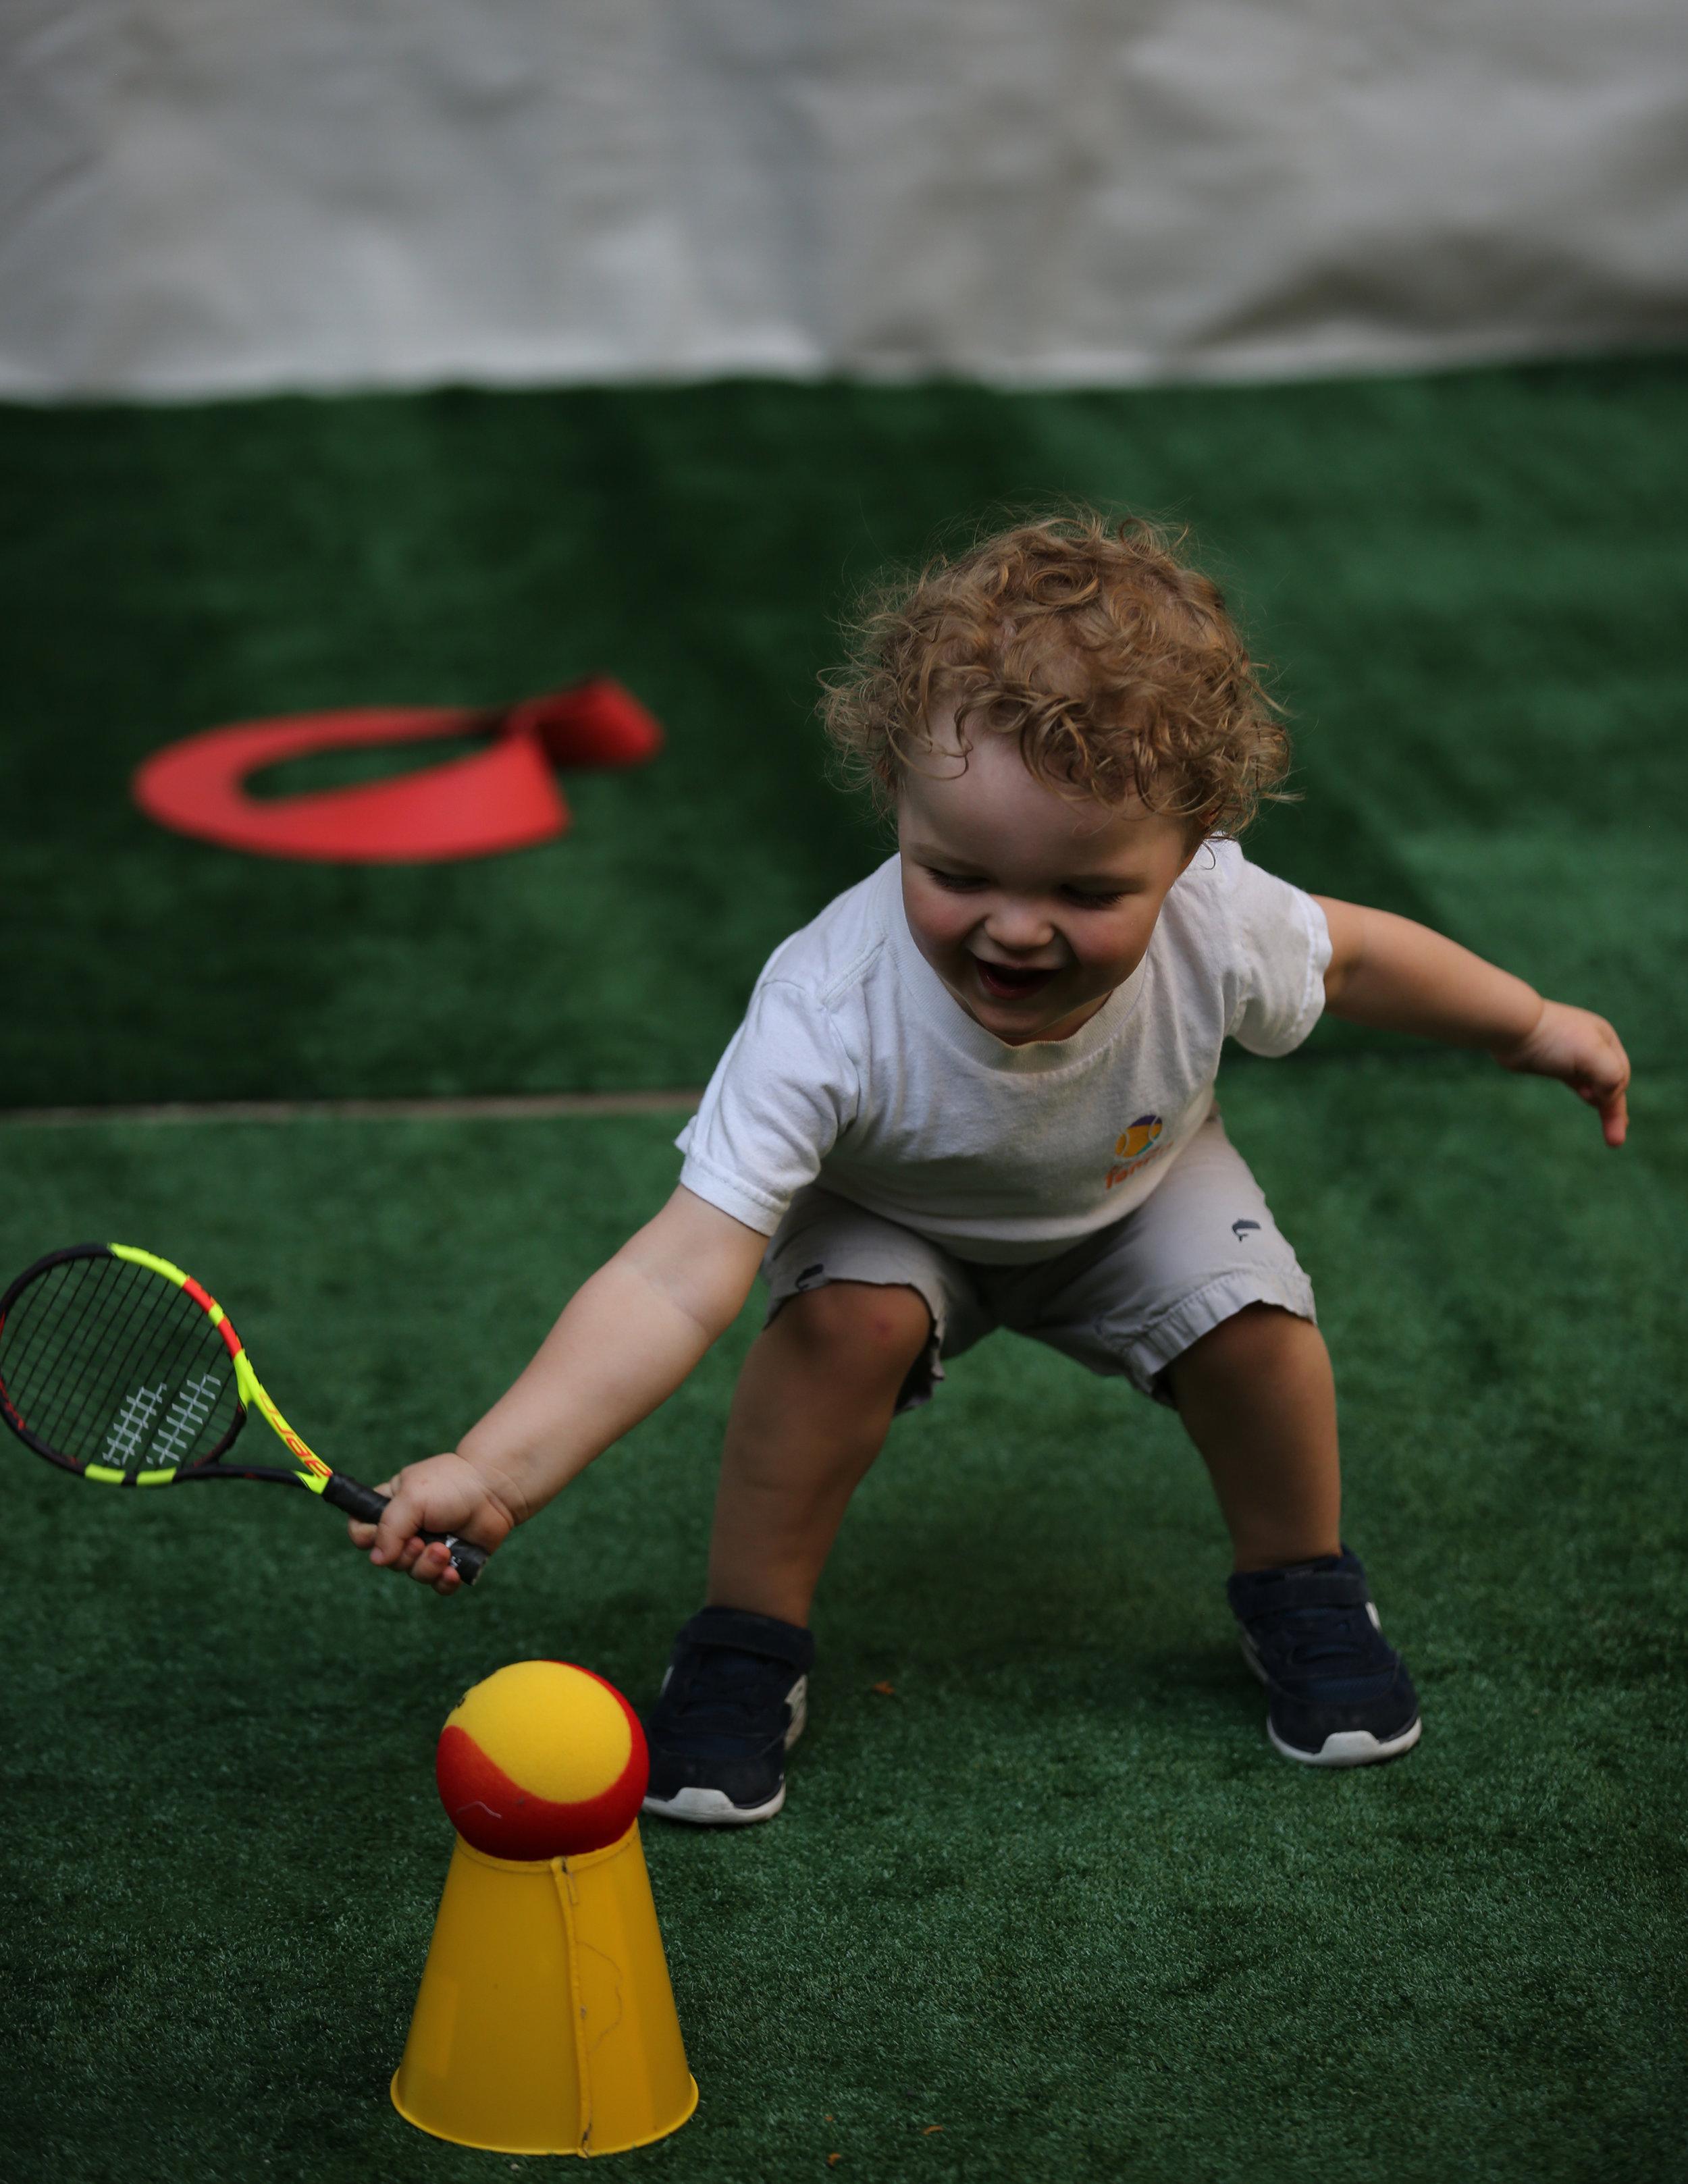 baby tennis website.JPG